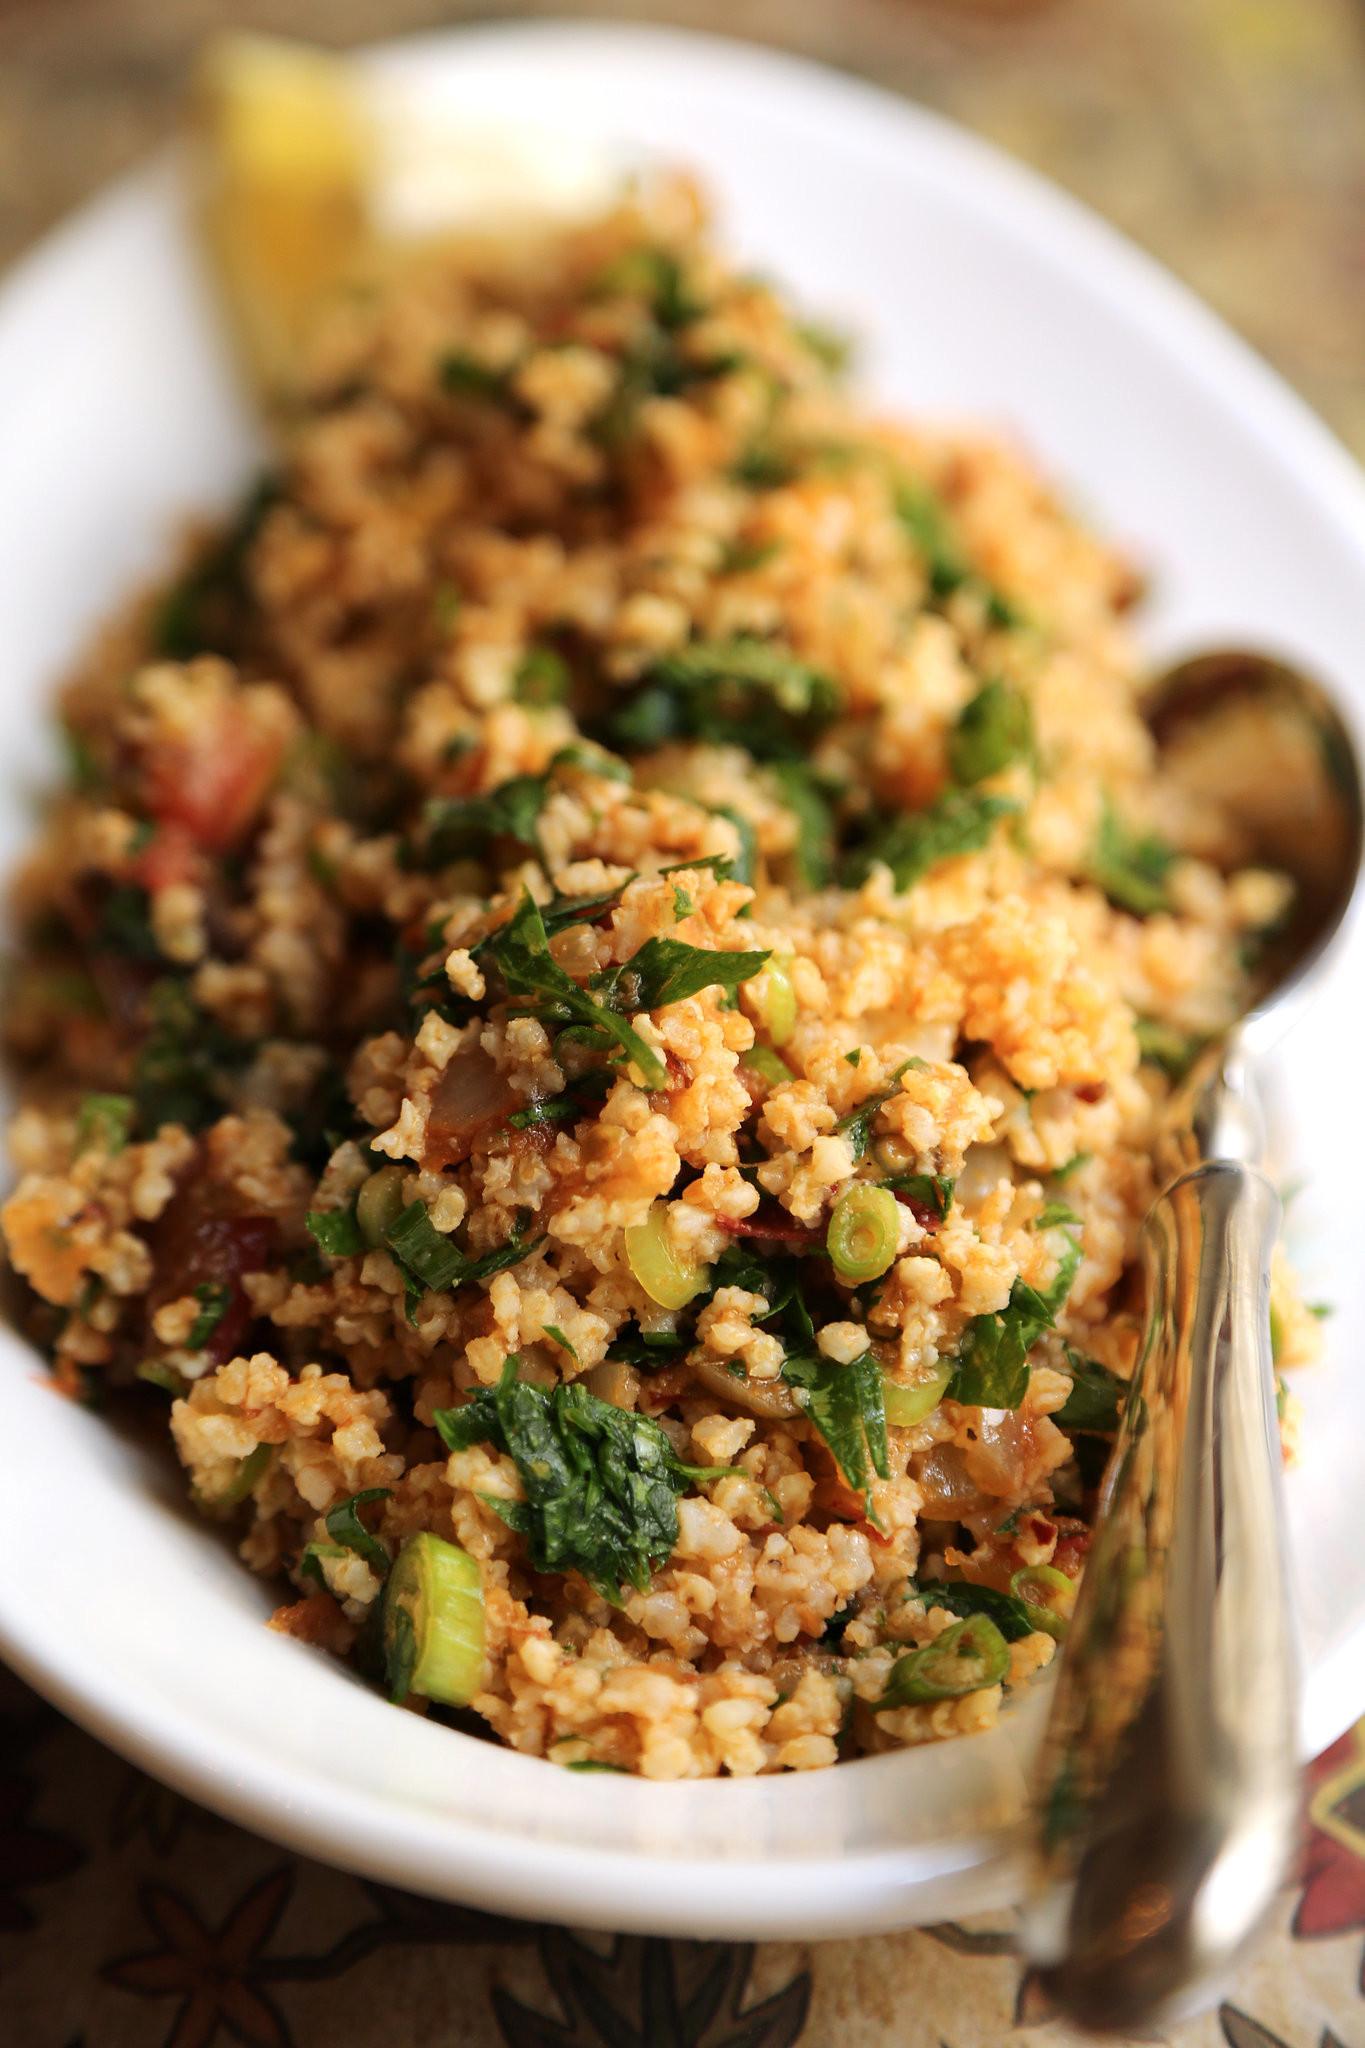 Quinoa Recipe Healthy  Fast Easy Healthy Recipe For Quinoa Tabbouleh